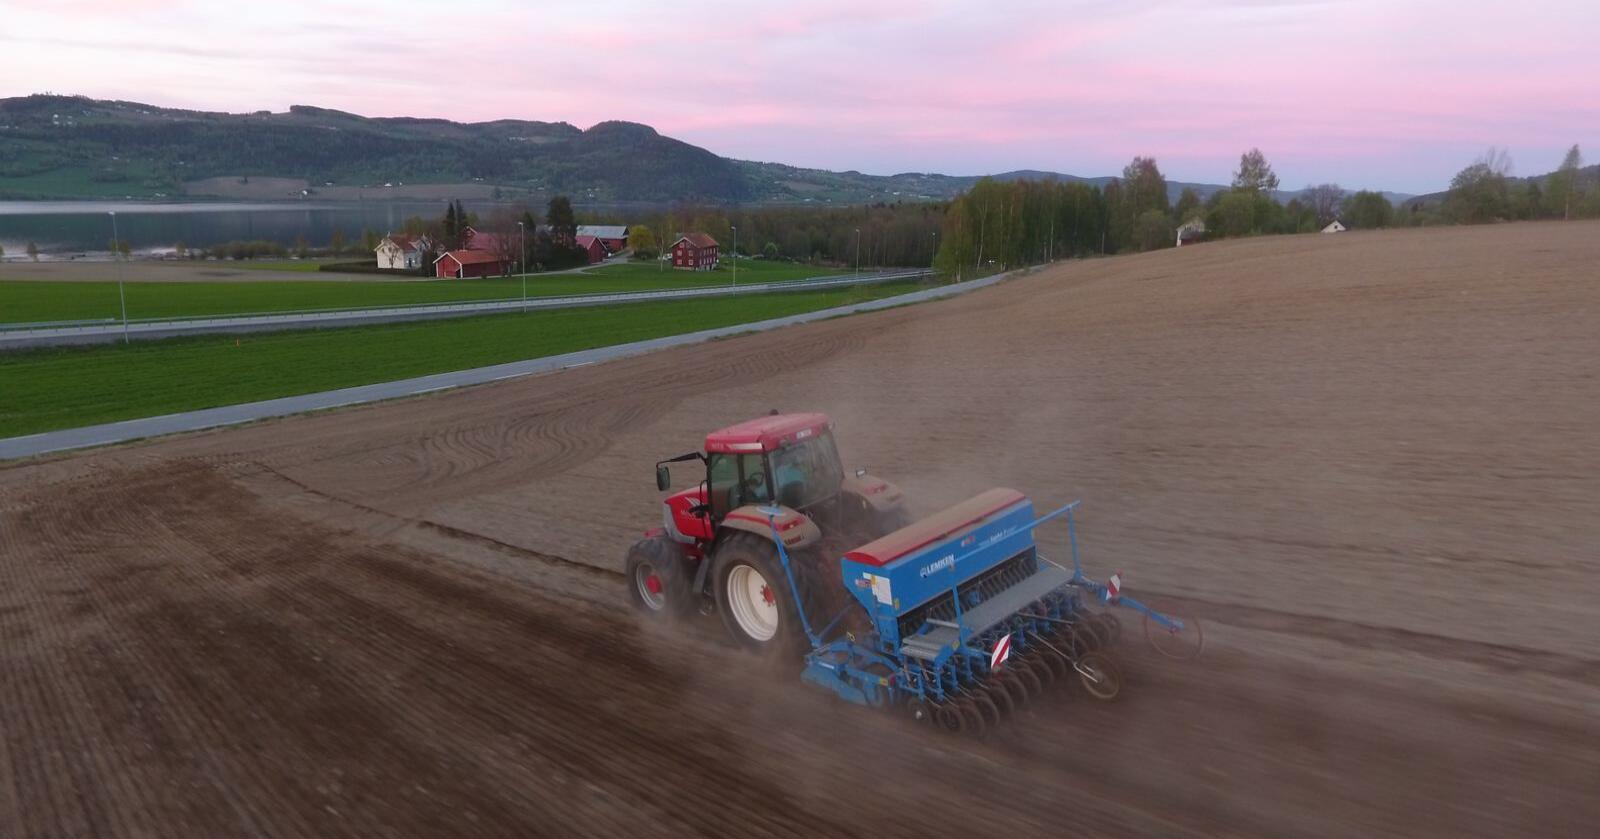 For kornprodusenter økes prisene med 10 og 17 øre per kilo og arealtilskuddet med ni kroner per dekar. Arkivfoto: Norsk Landbruk